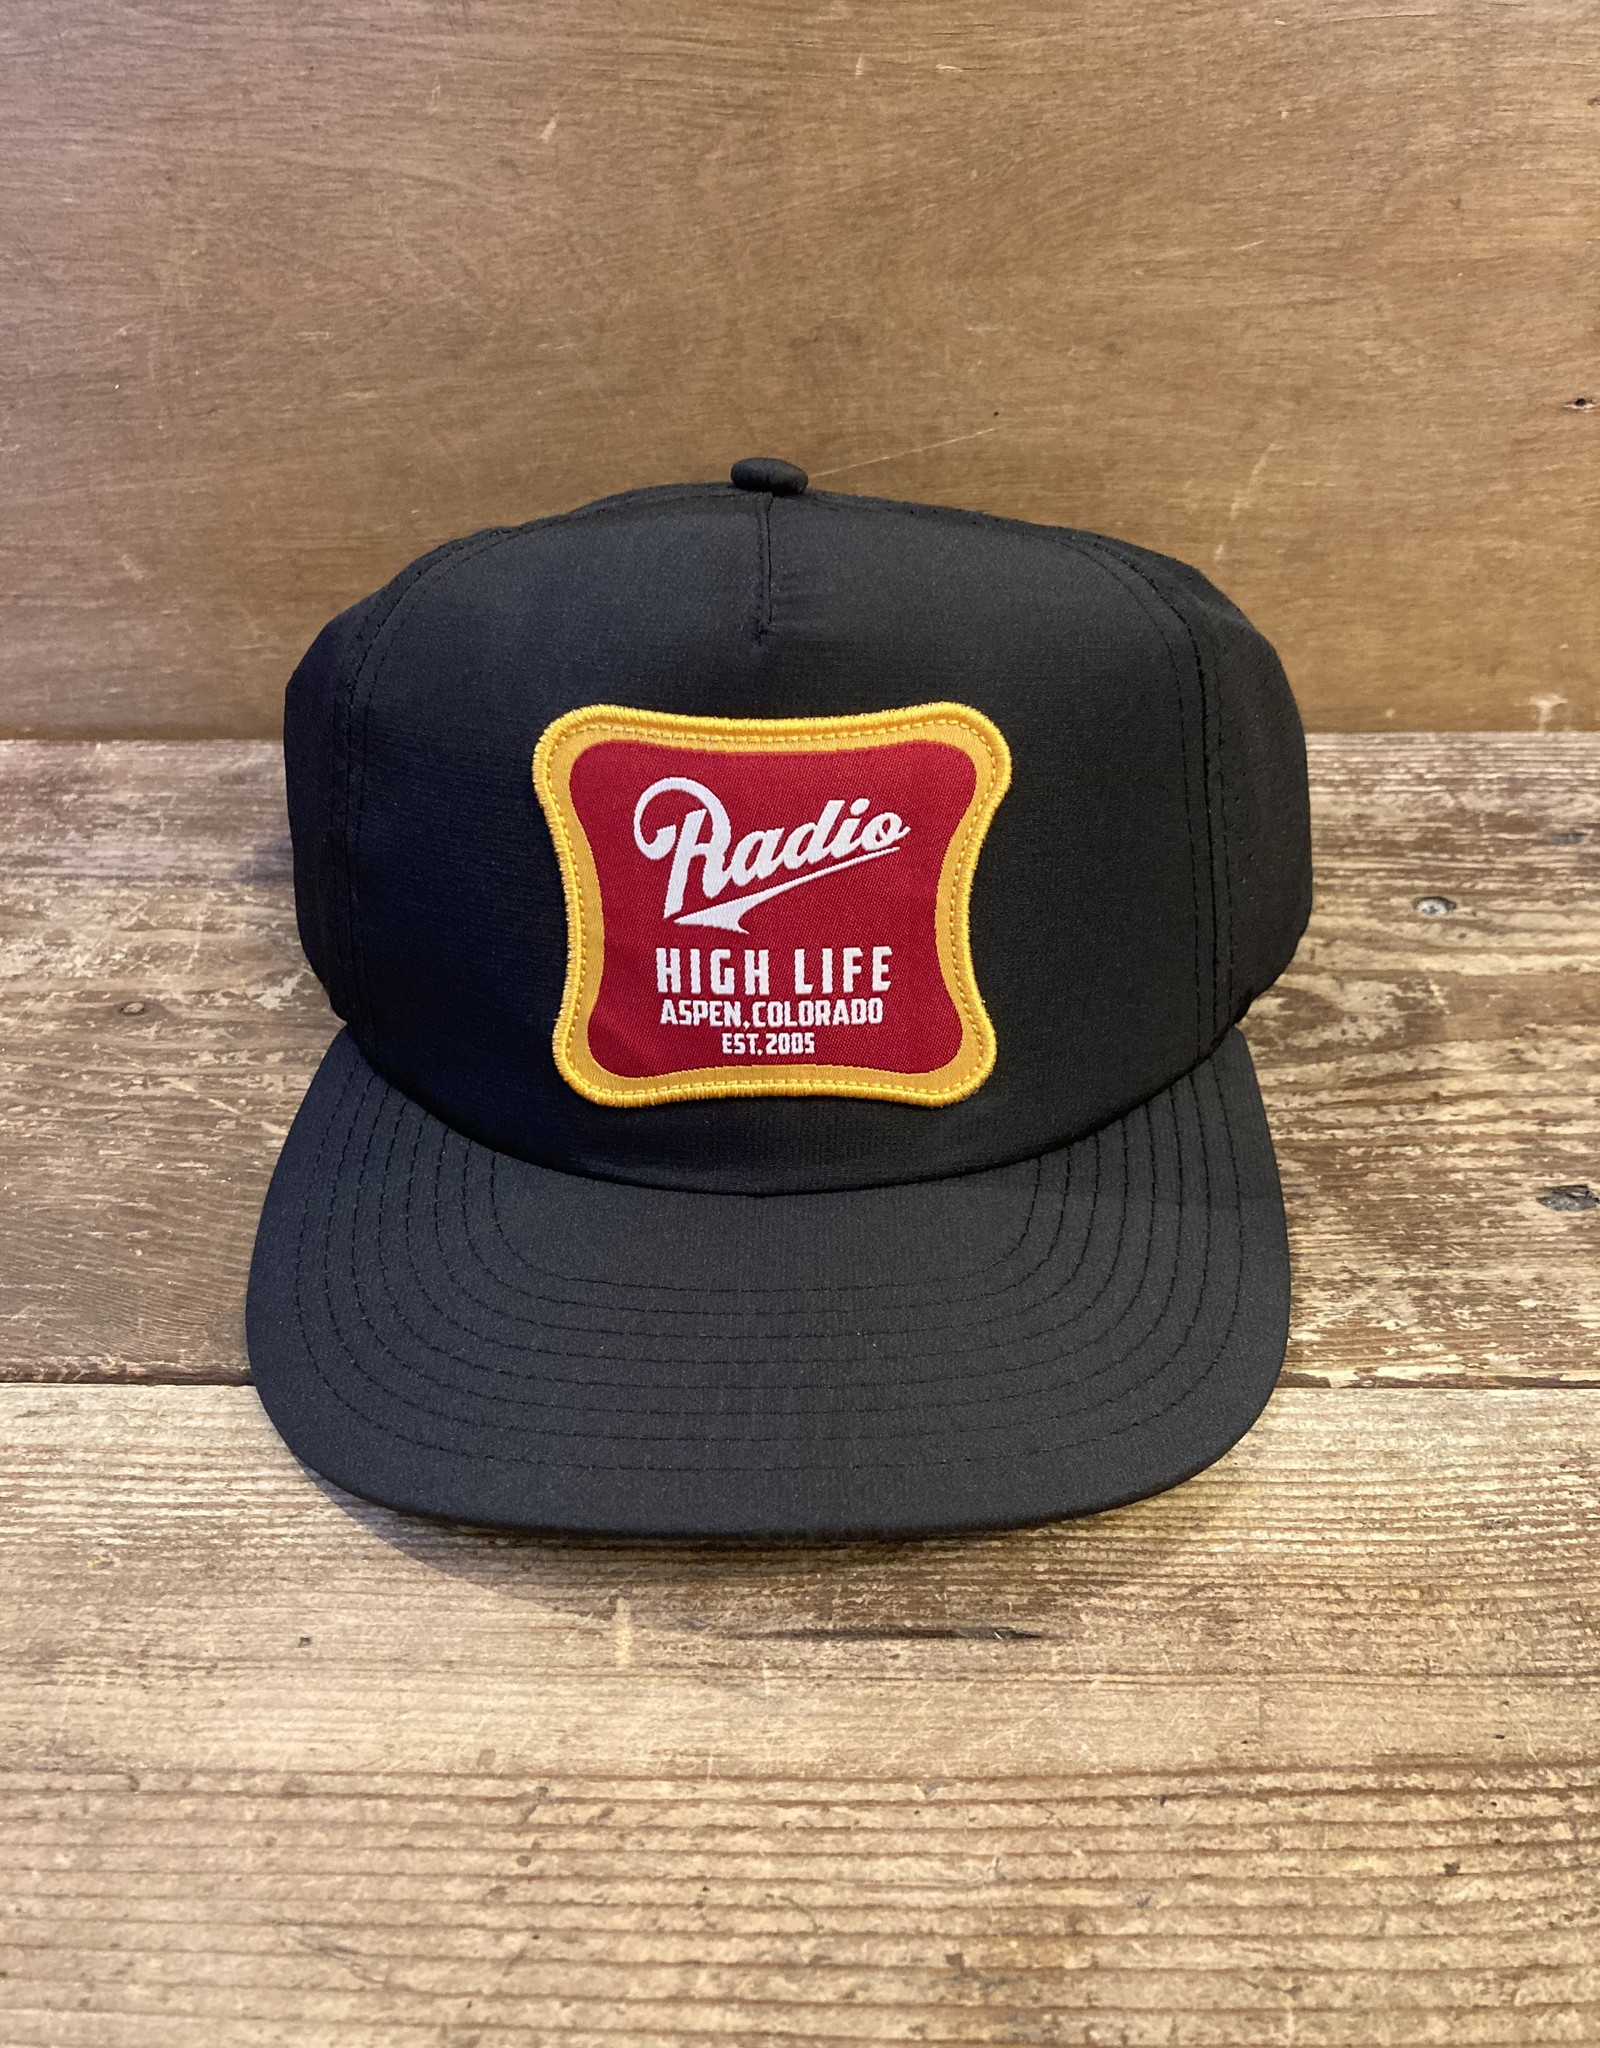 RADIO HIGH LIFE PERFORATED HAT